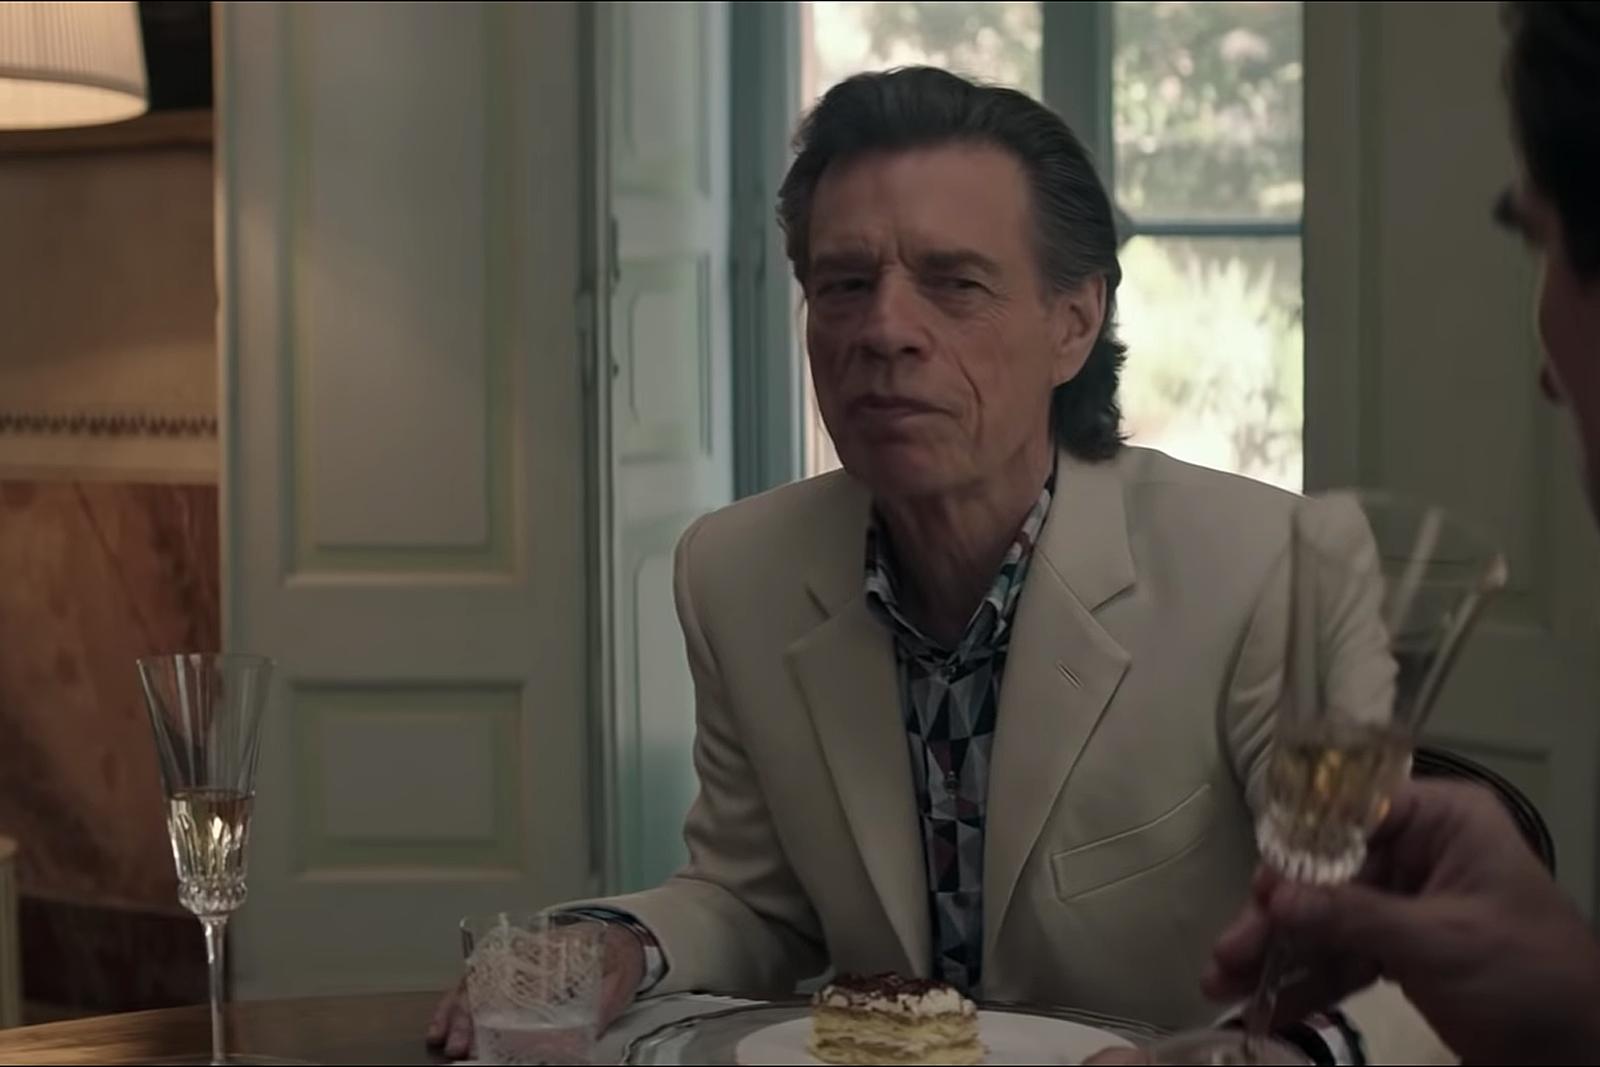 Watch Mick Jagger in 'The Burnt Orange Heresy' Trailer